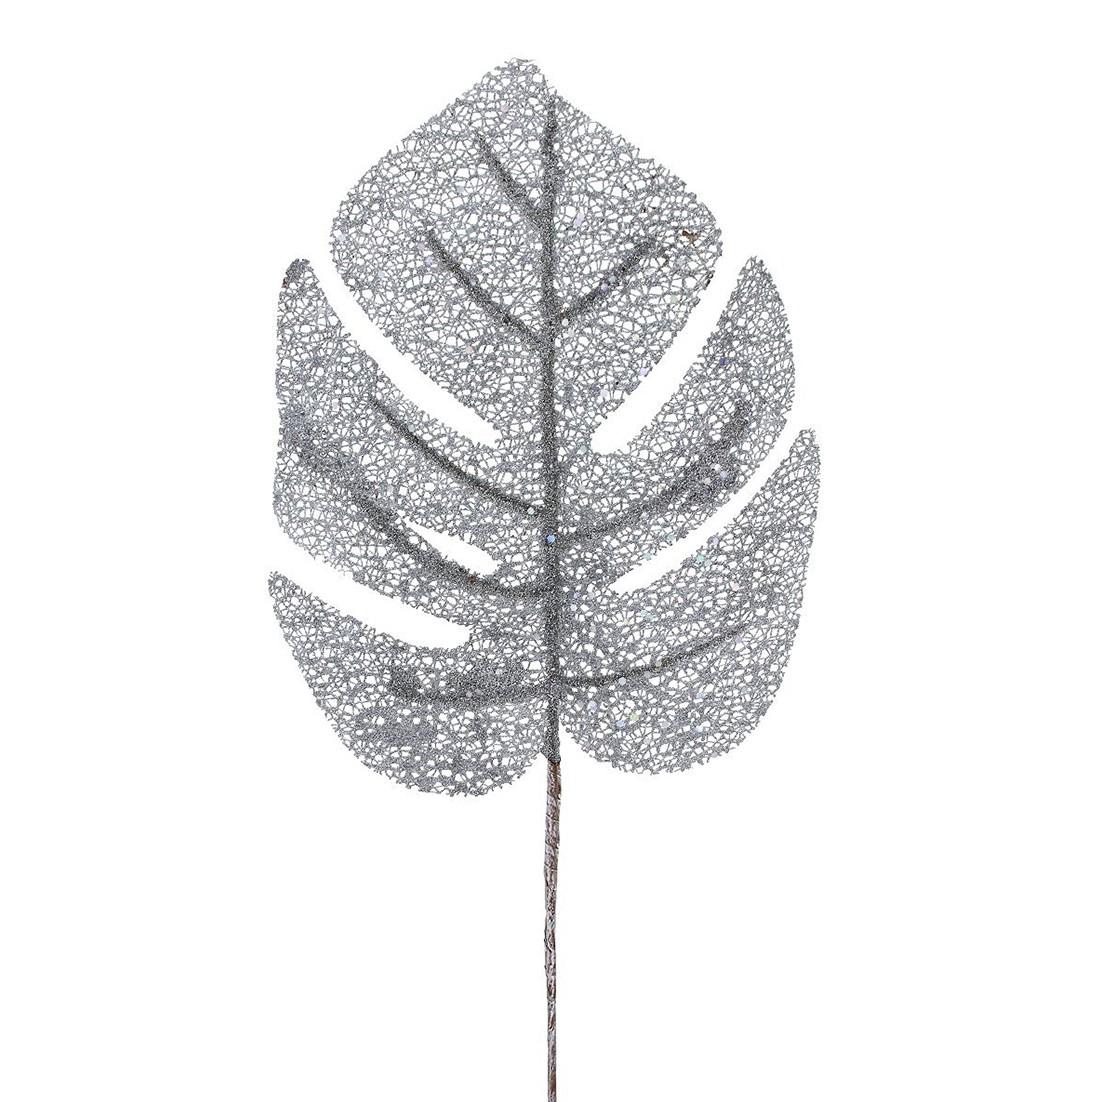 Haste Natalina 57 cm Costela de Adao Prata - 16369-151